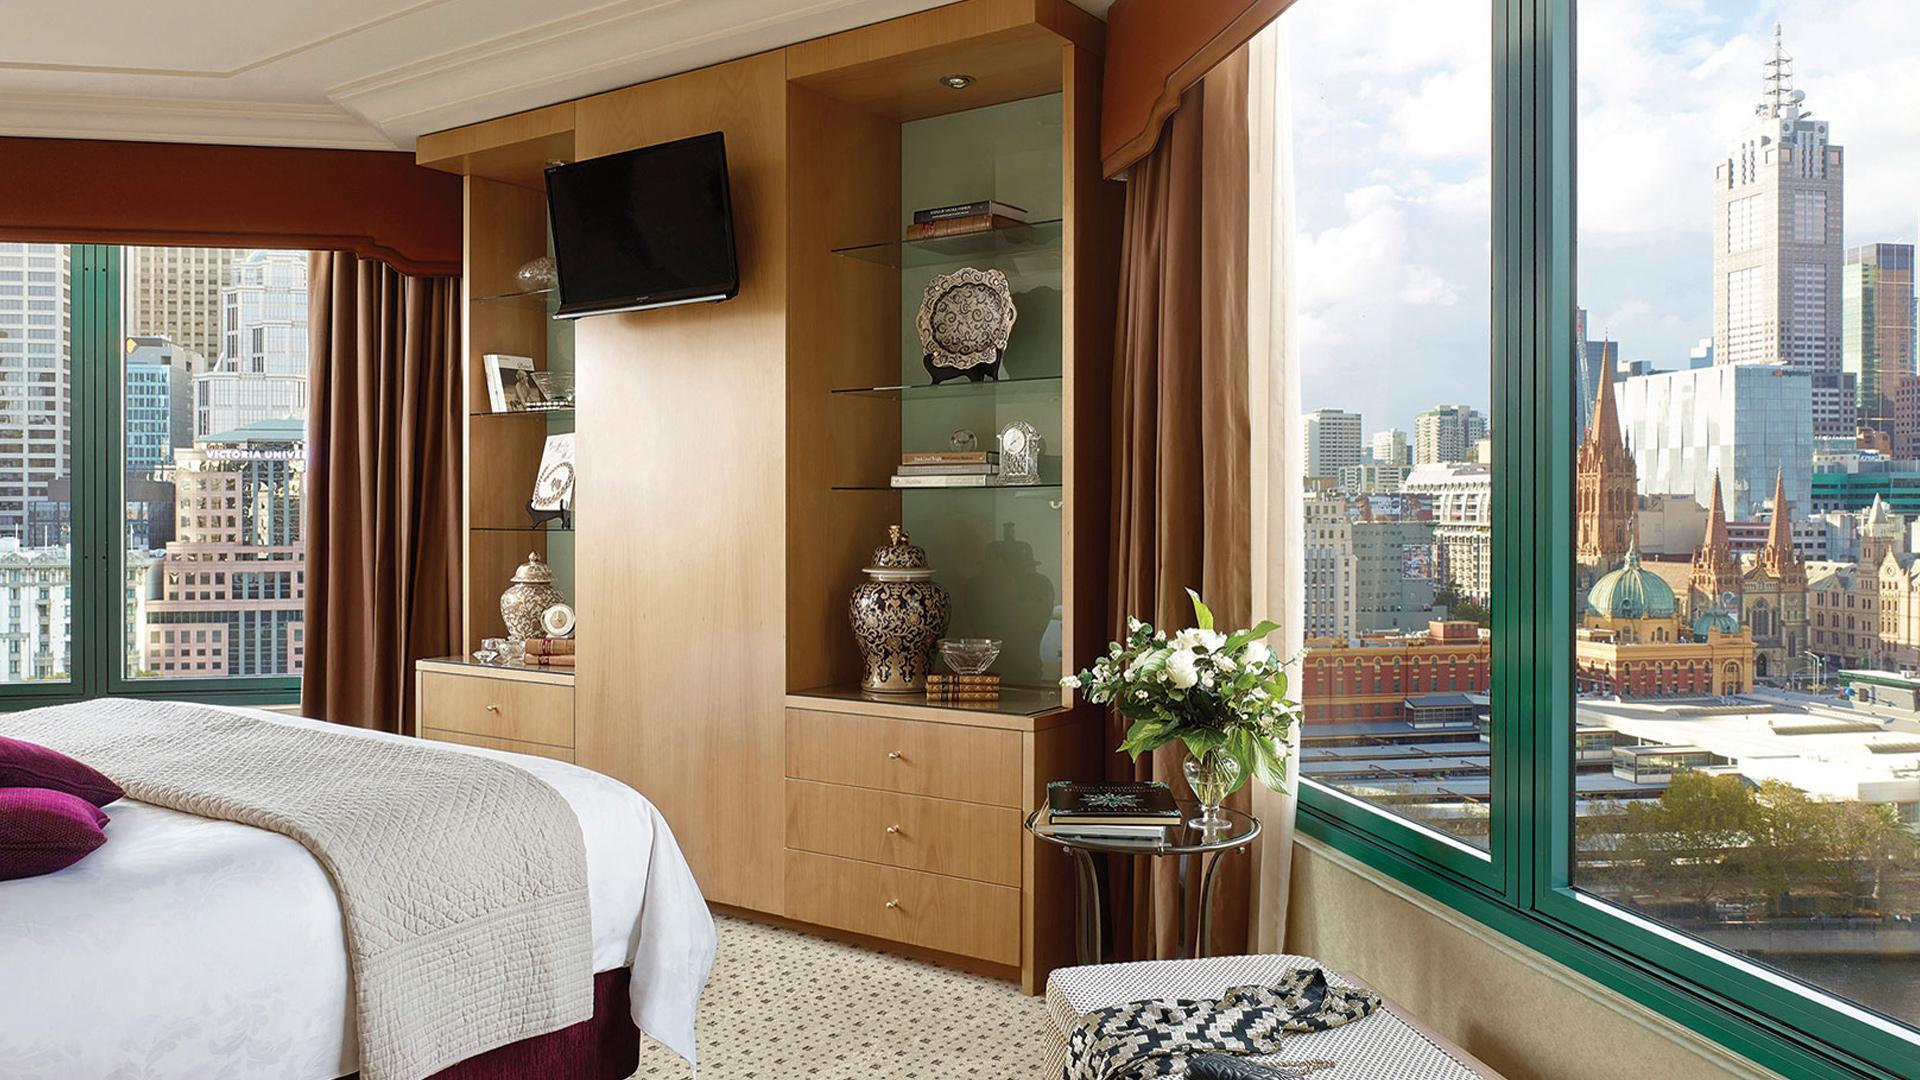 One Bedroom Suite image 1 at The Langham Melbourne by Melbourne City, Victoria, Australia